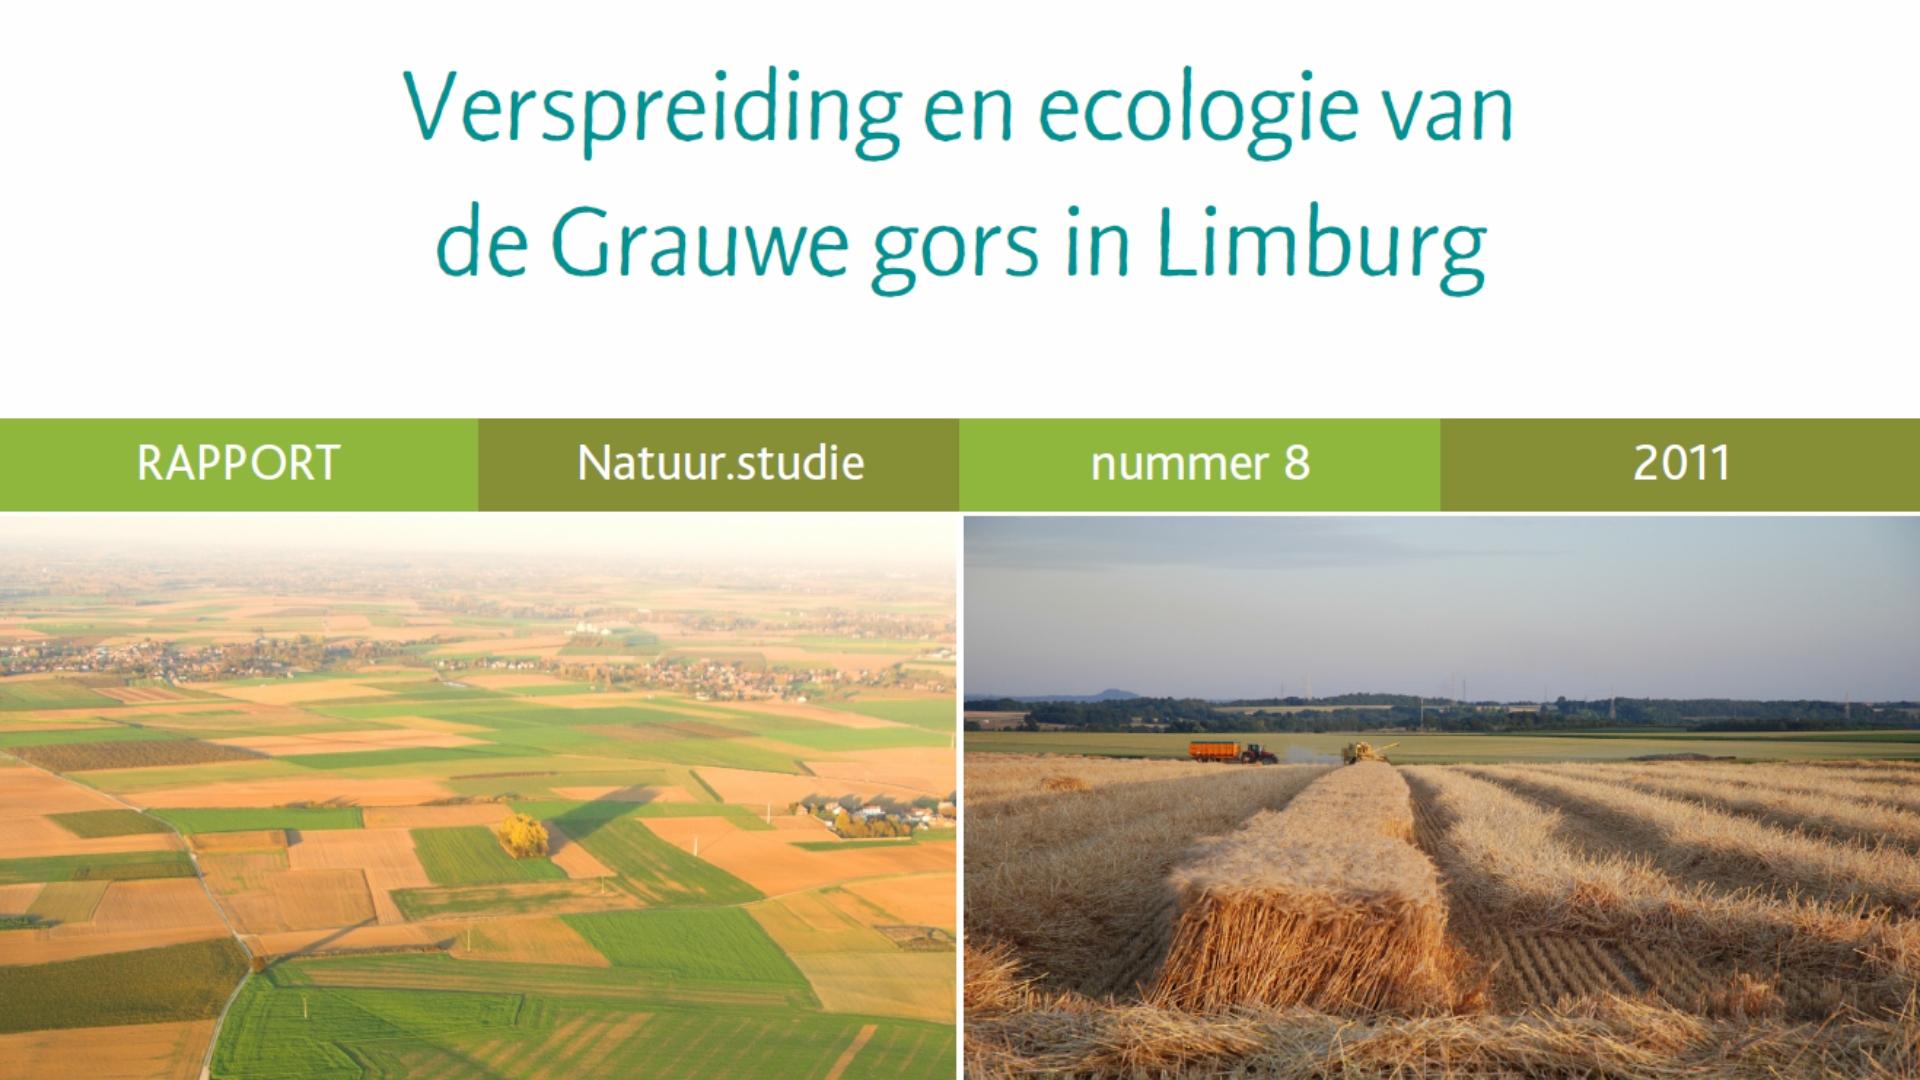 De Grauwe gors in Limburg (2011)